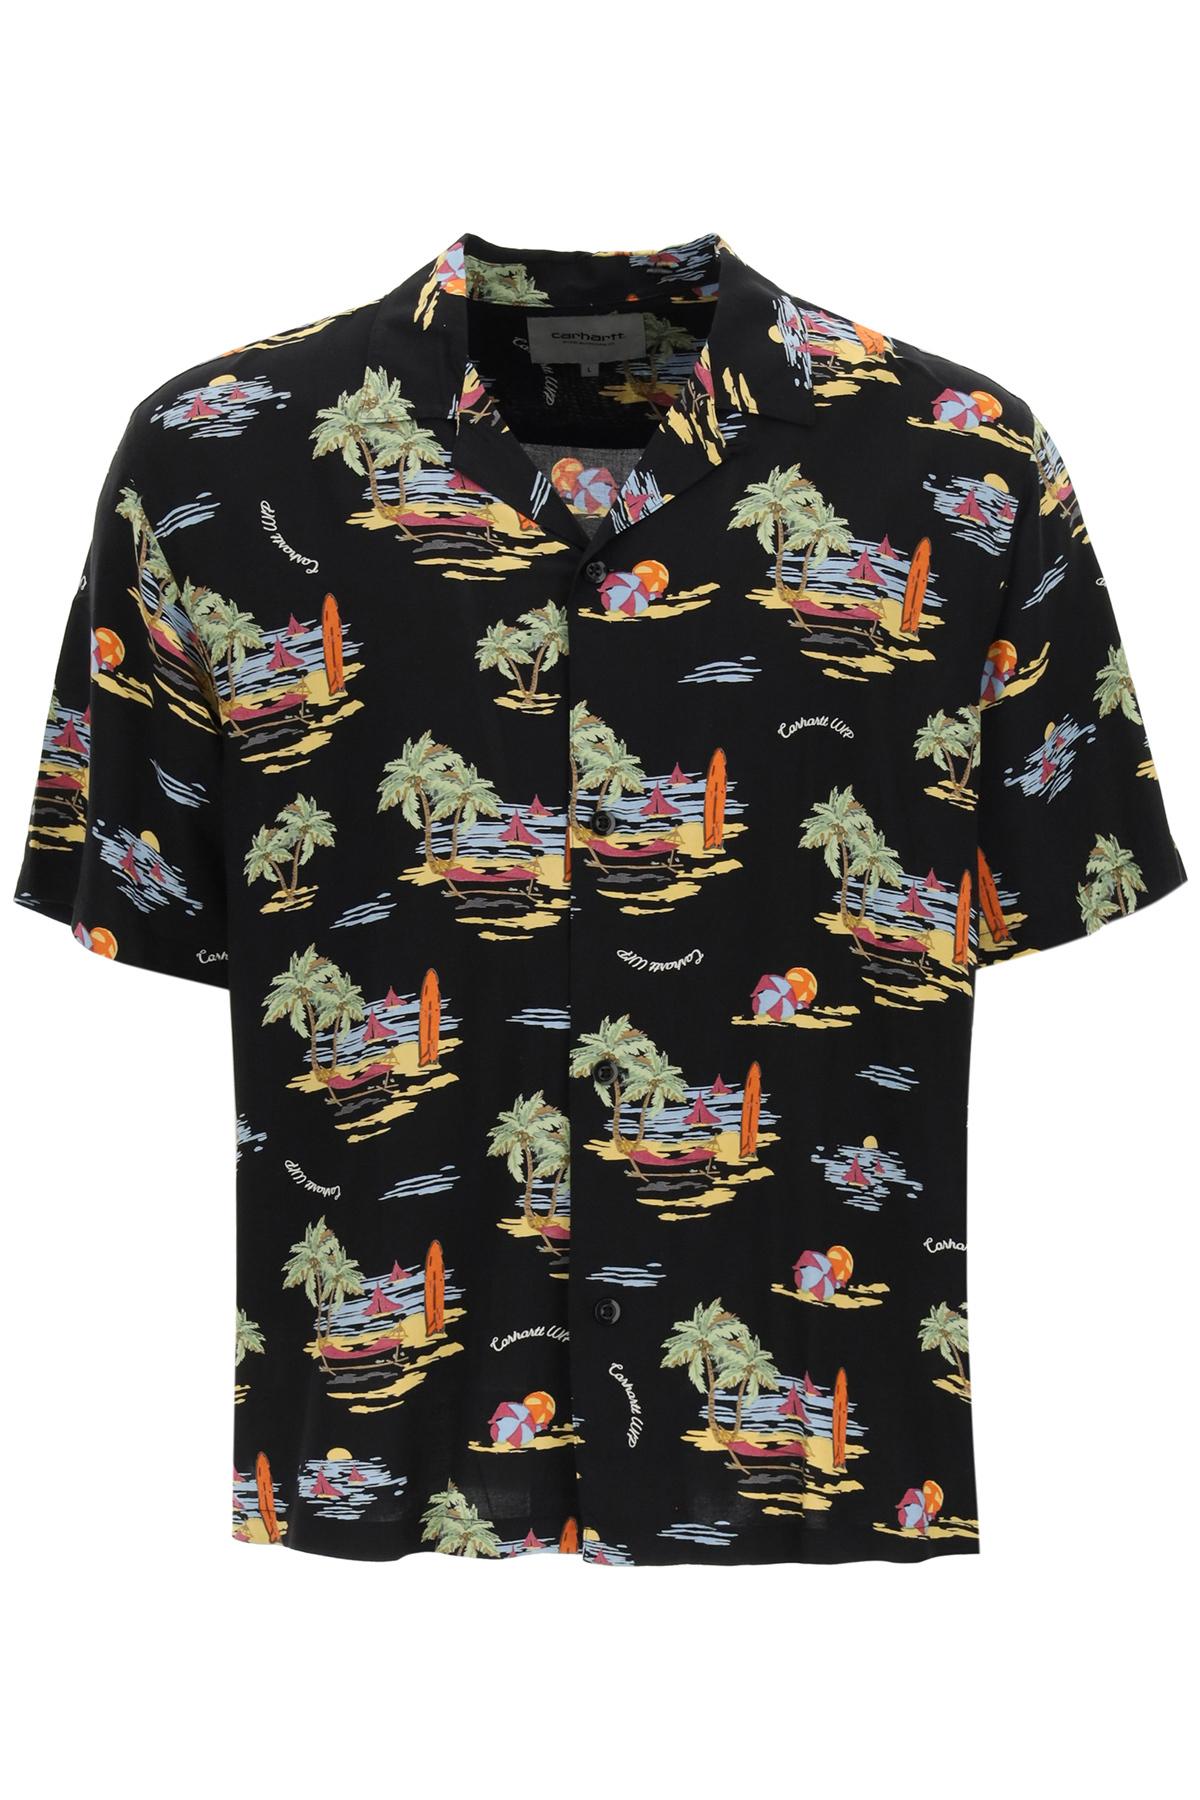 Carhartt camicia hawaiian stampa beach